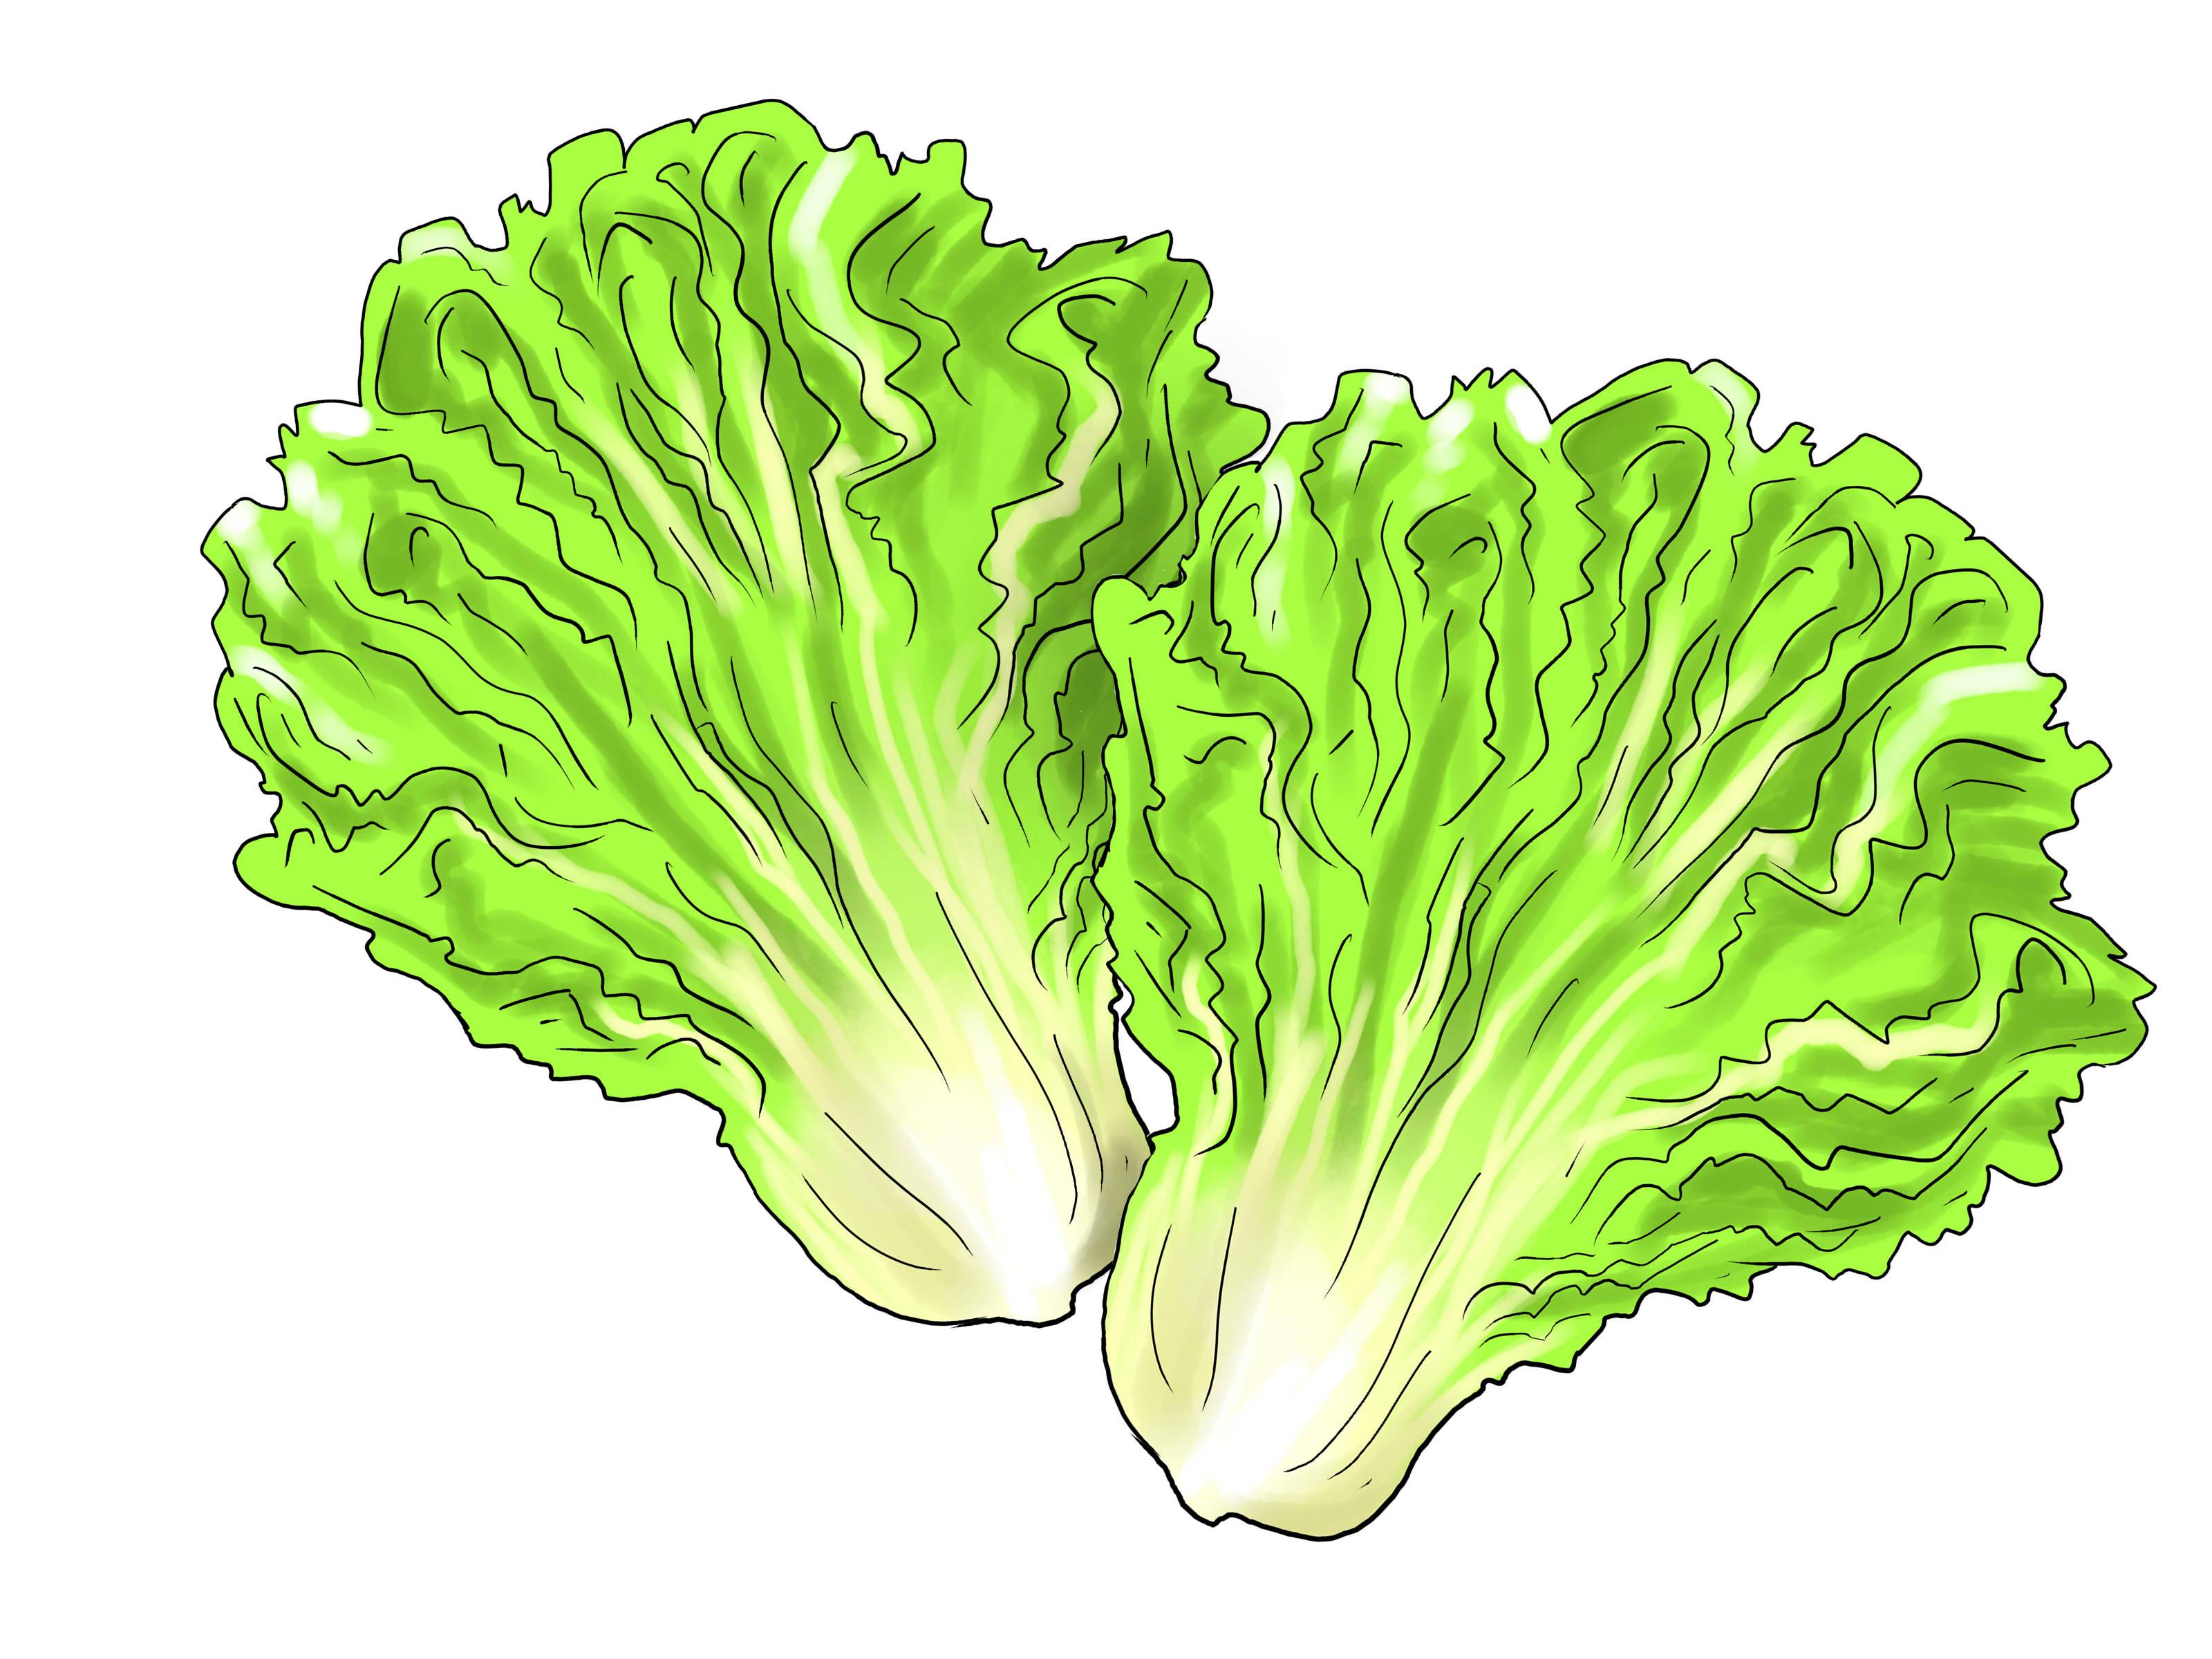 Free Lettuce Leaf Png, Download Free Clip Art, Free Clip Art.